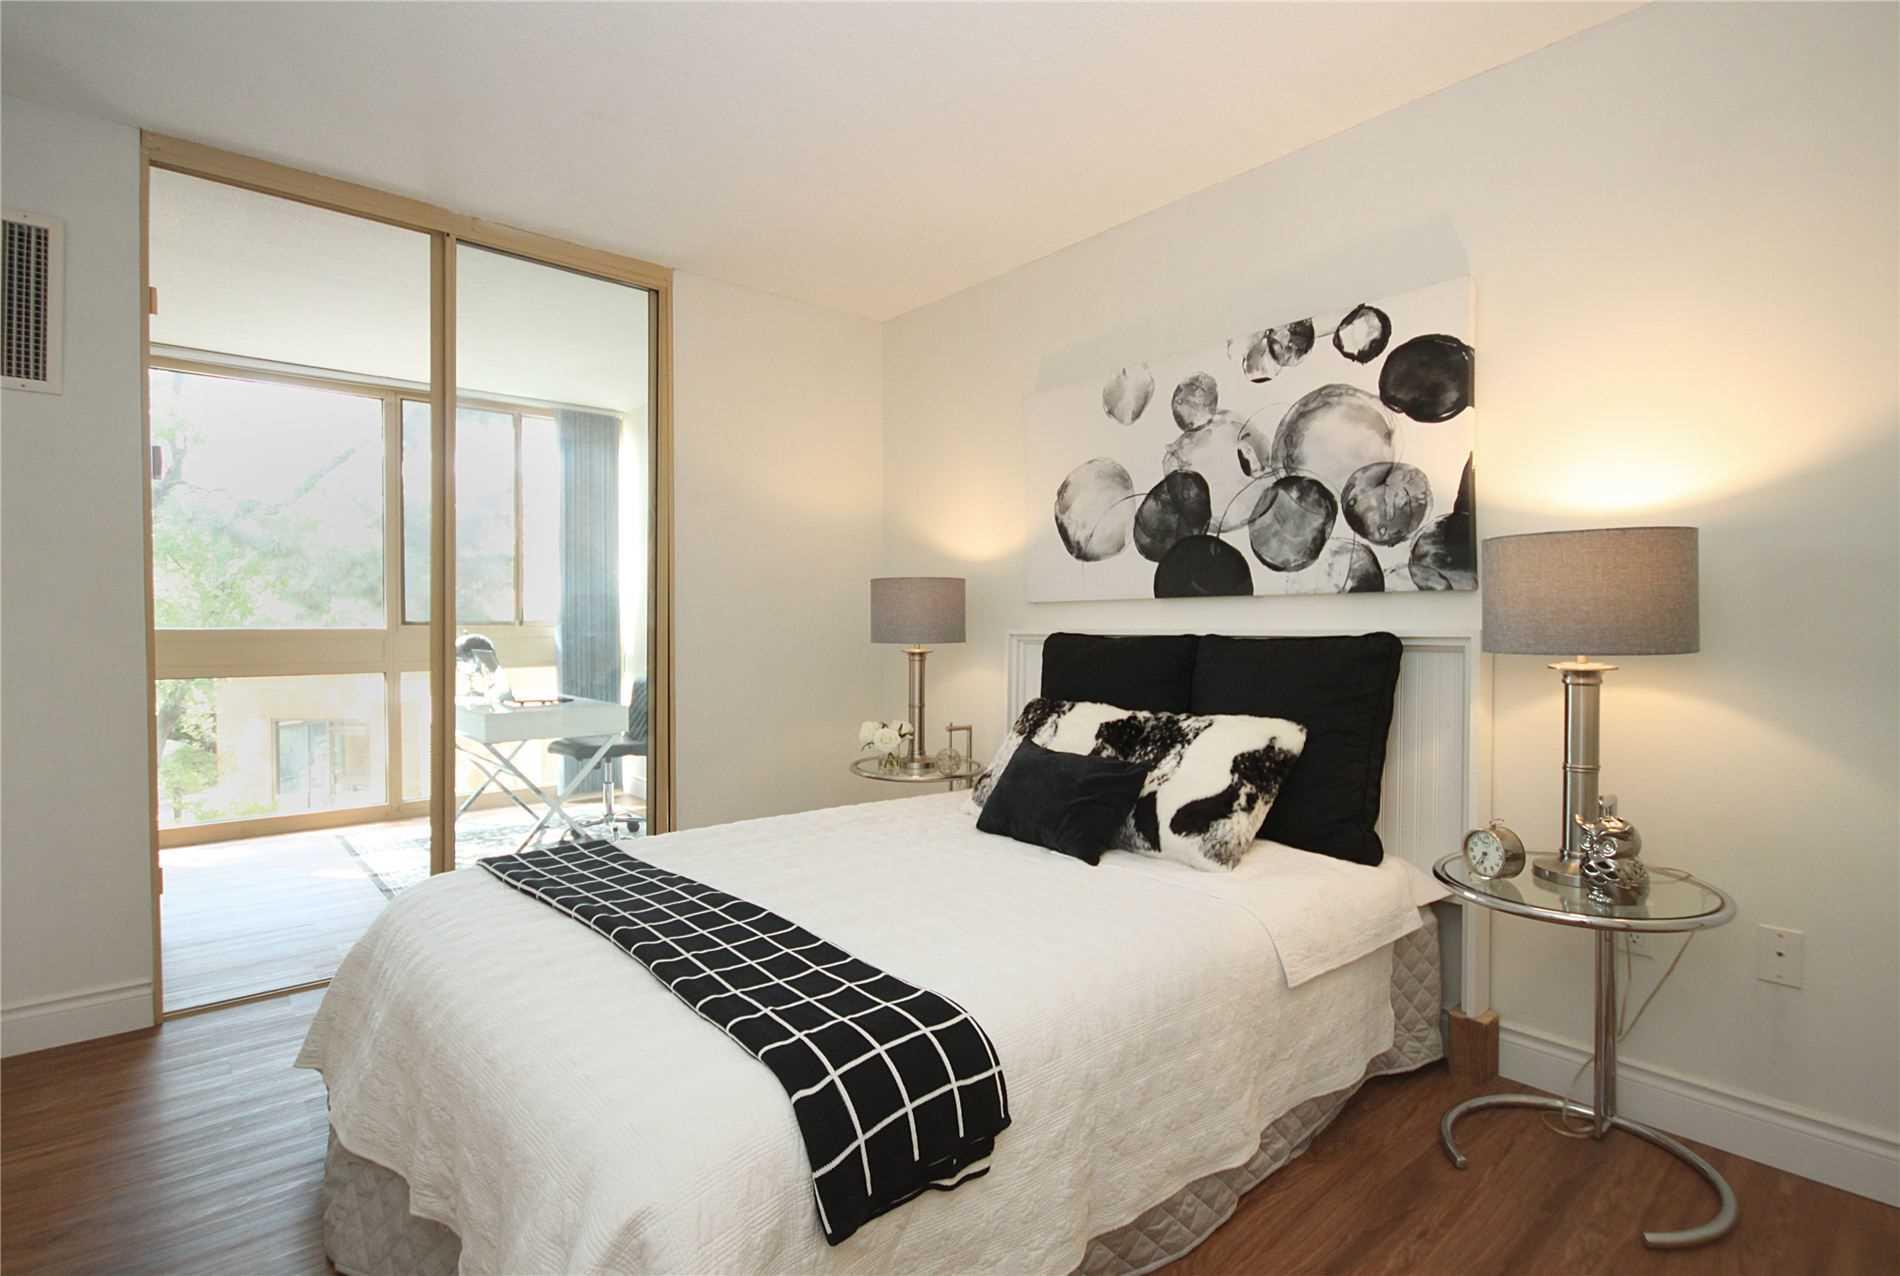 Condo Apt For Sale In Toronto , 2 Bedrooms Bedrooms, ,2 BathroomsBathrooms,Condo Apt,For Sale,209,Beecroft